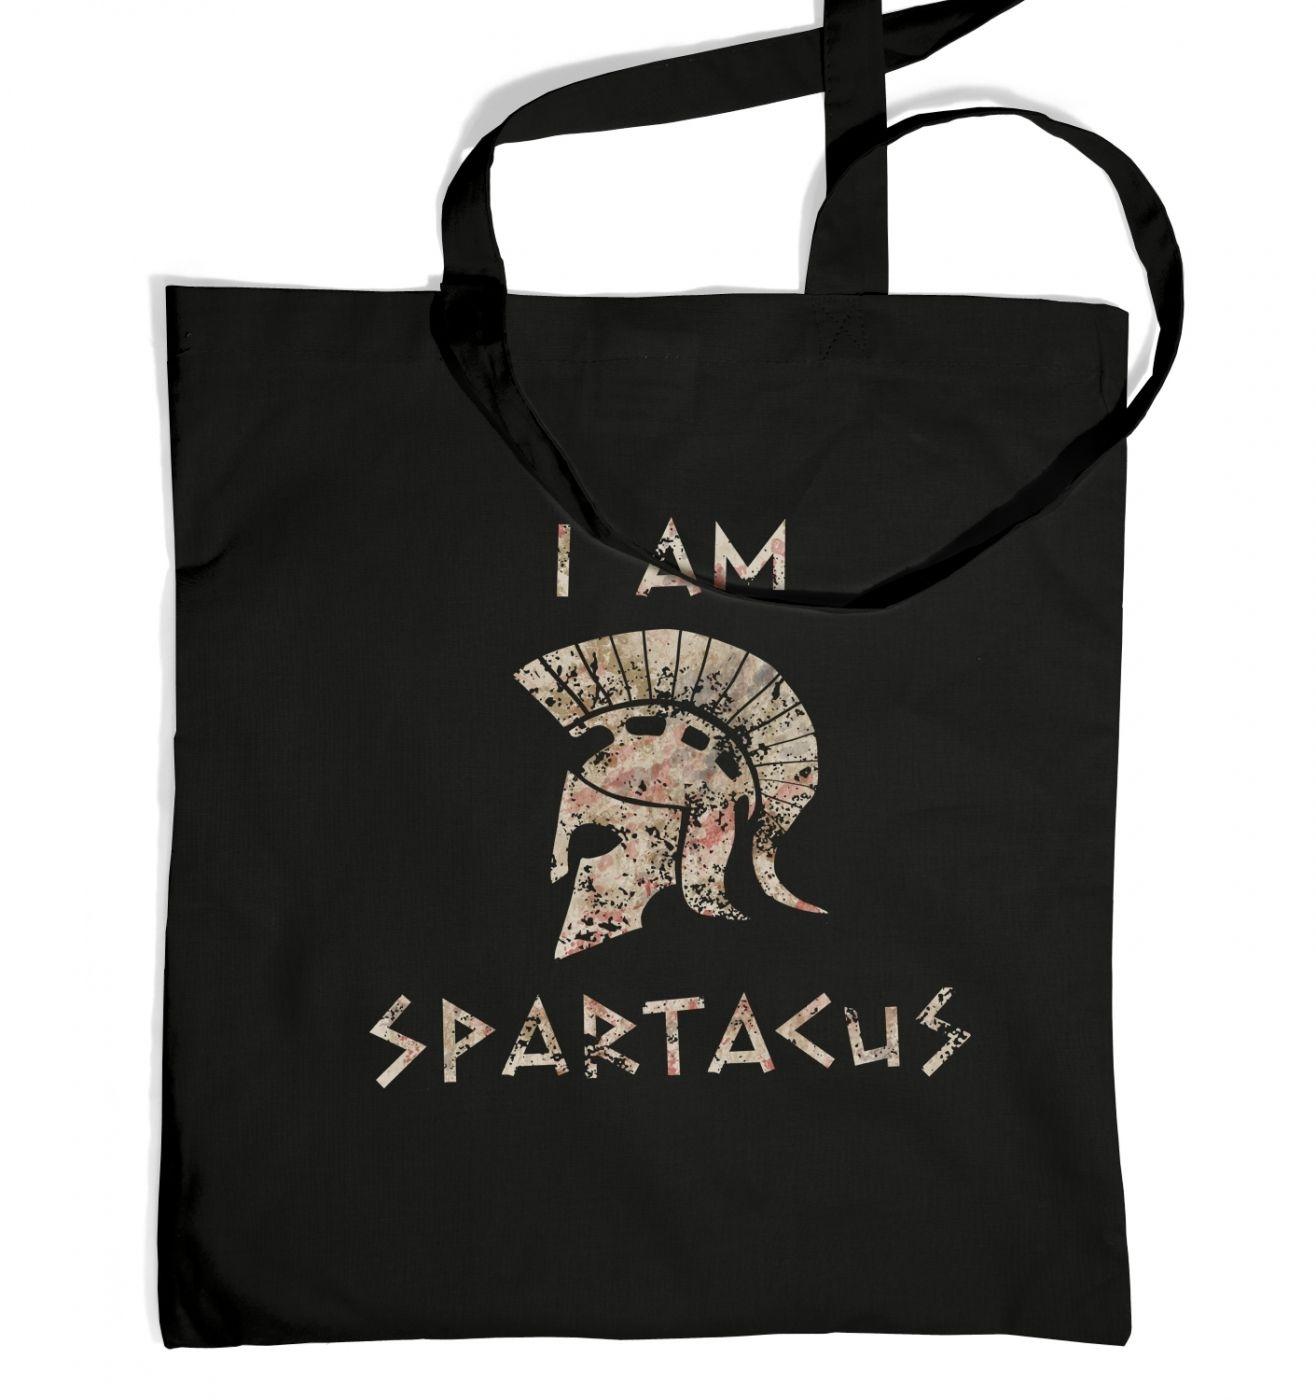 I Am Spartacus tote bag